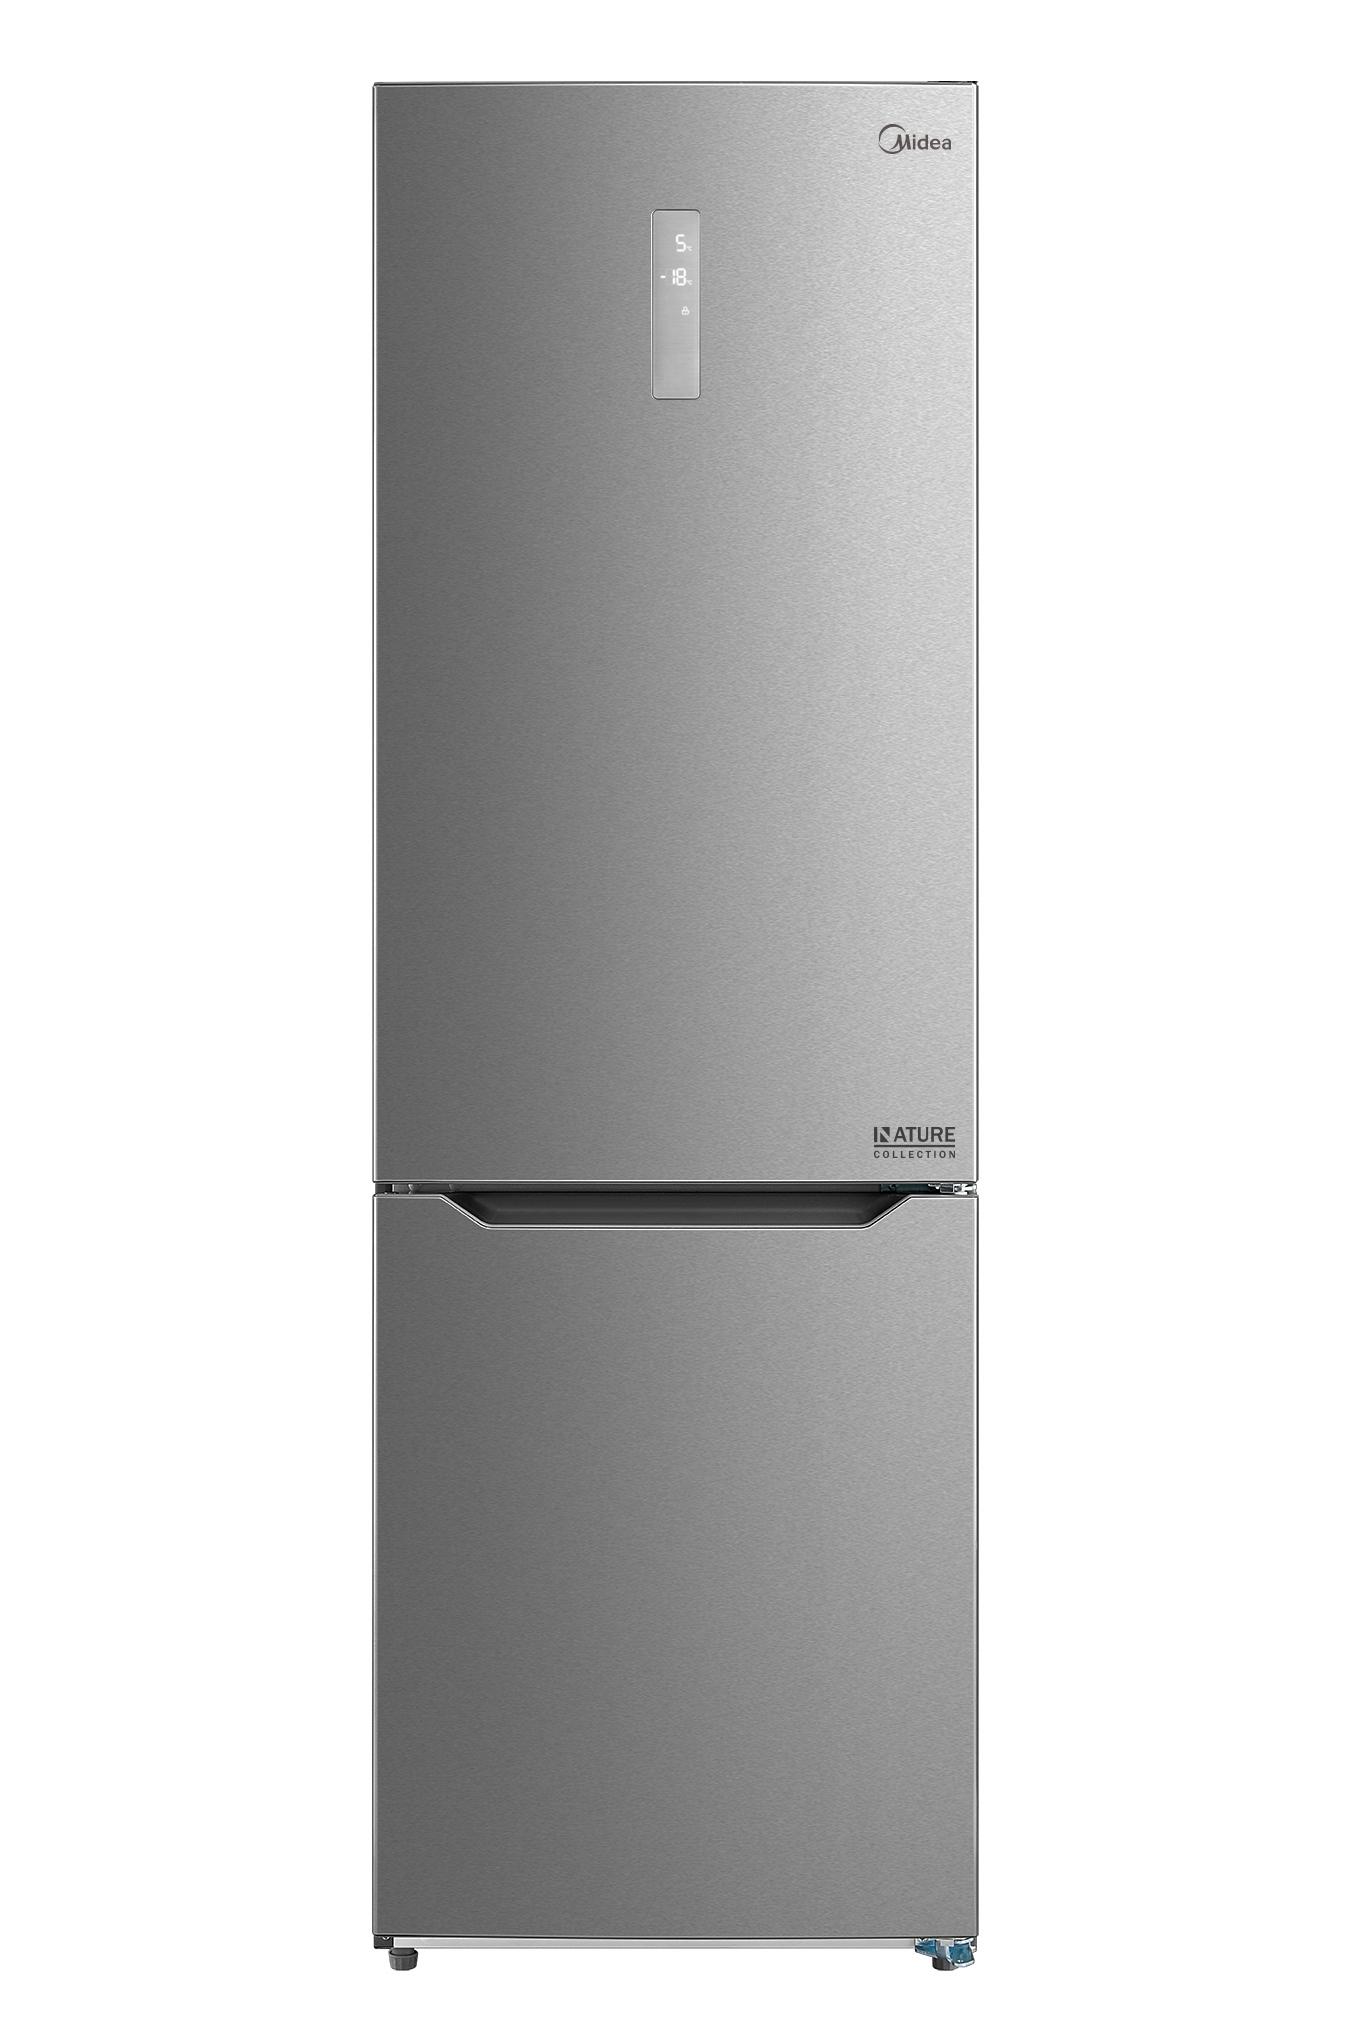 Midea MRB519SFNX1 (HD-400RWE2N) silver